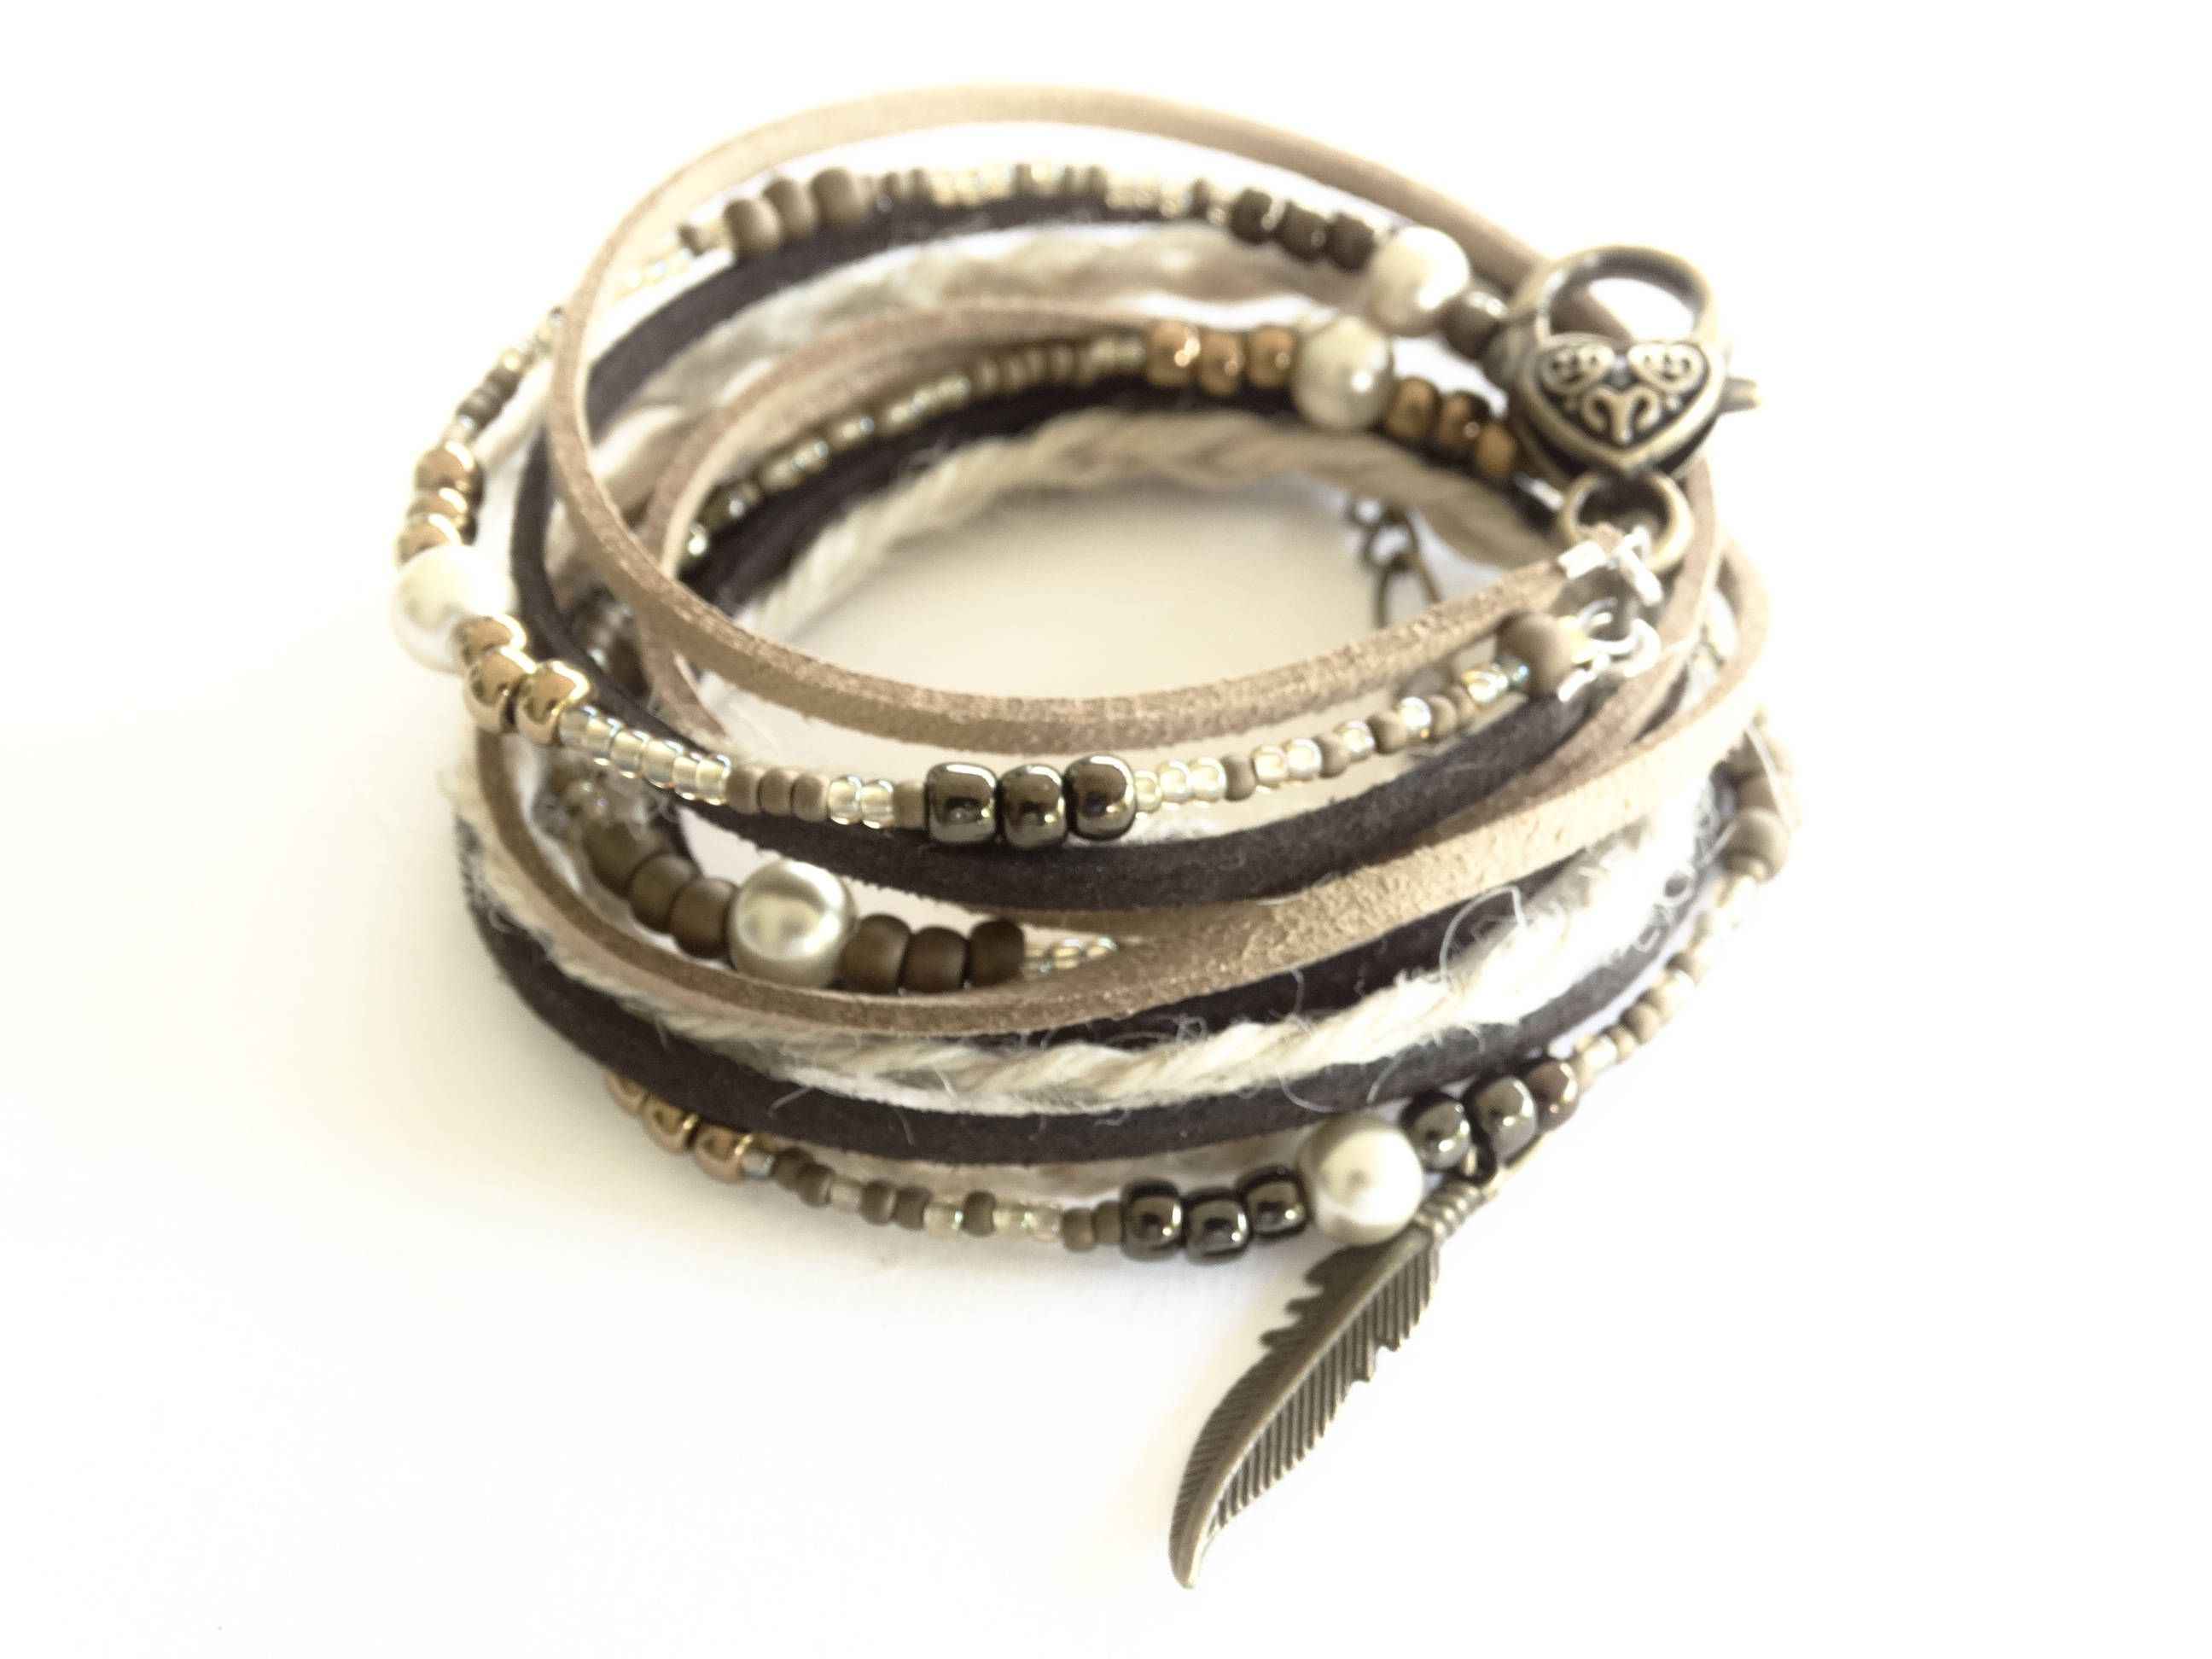 Leather Bracelet For Woman Boho Wrap Bracelet Leather Beaded Etsy Leather Bracelets Women Leather Accessories Women Wrap Bracelet